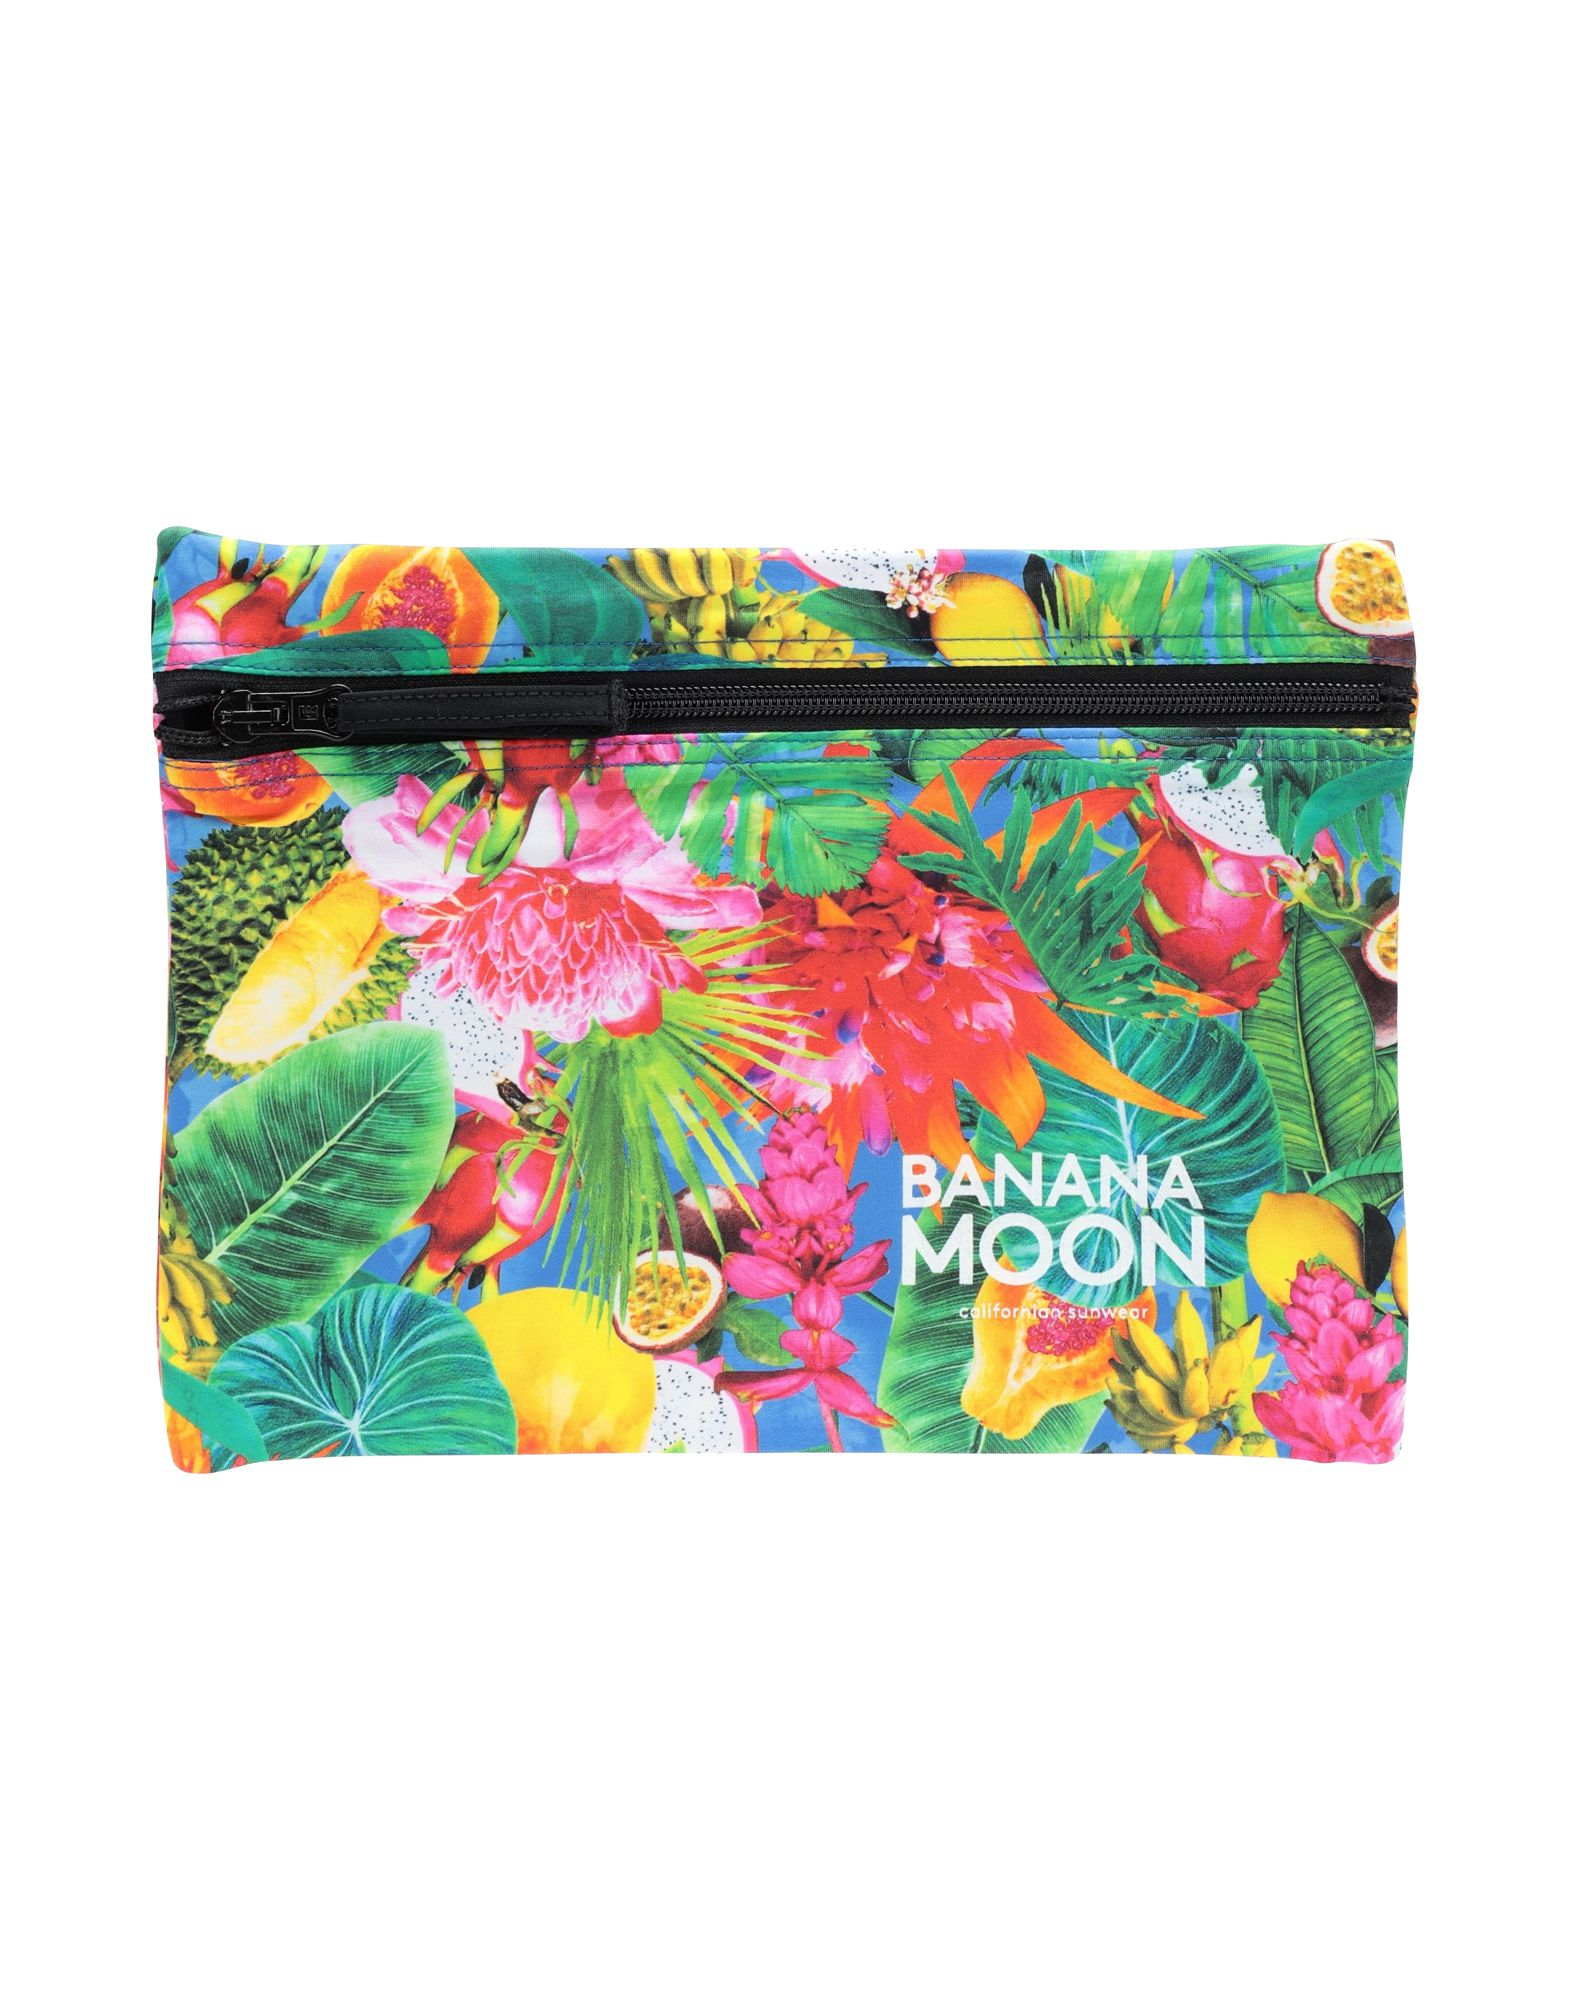 BANANA MOON Косметичка косметичка dumpling packages 2014